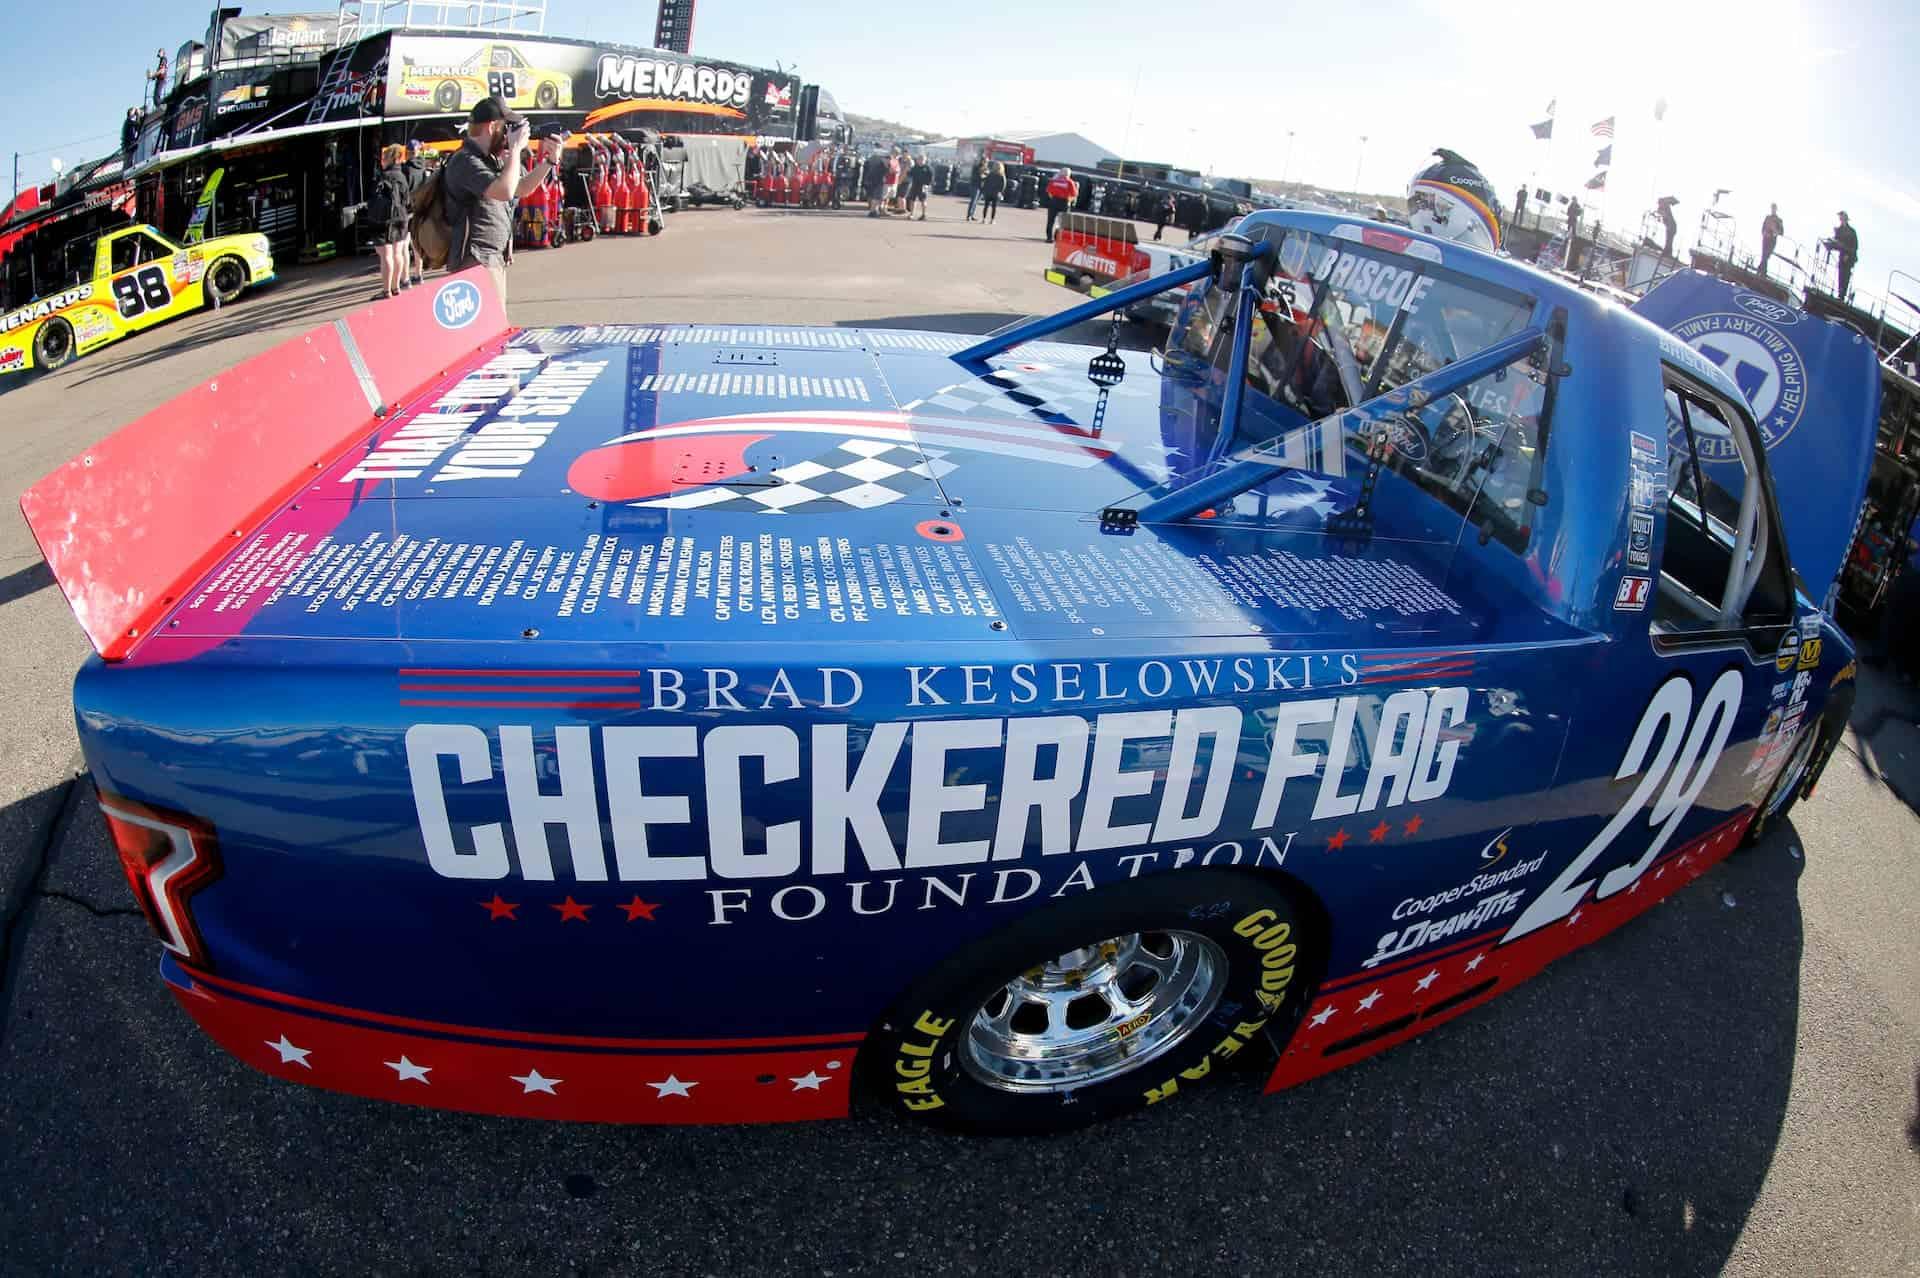 Brad Keselowski's Checkered Flag Foundation wins the 2021 Second Quarter Pocono Spirit Award by the NMPA.